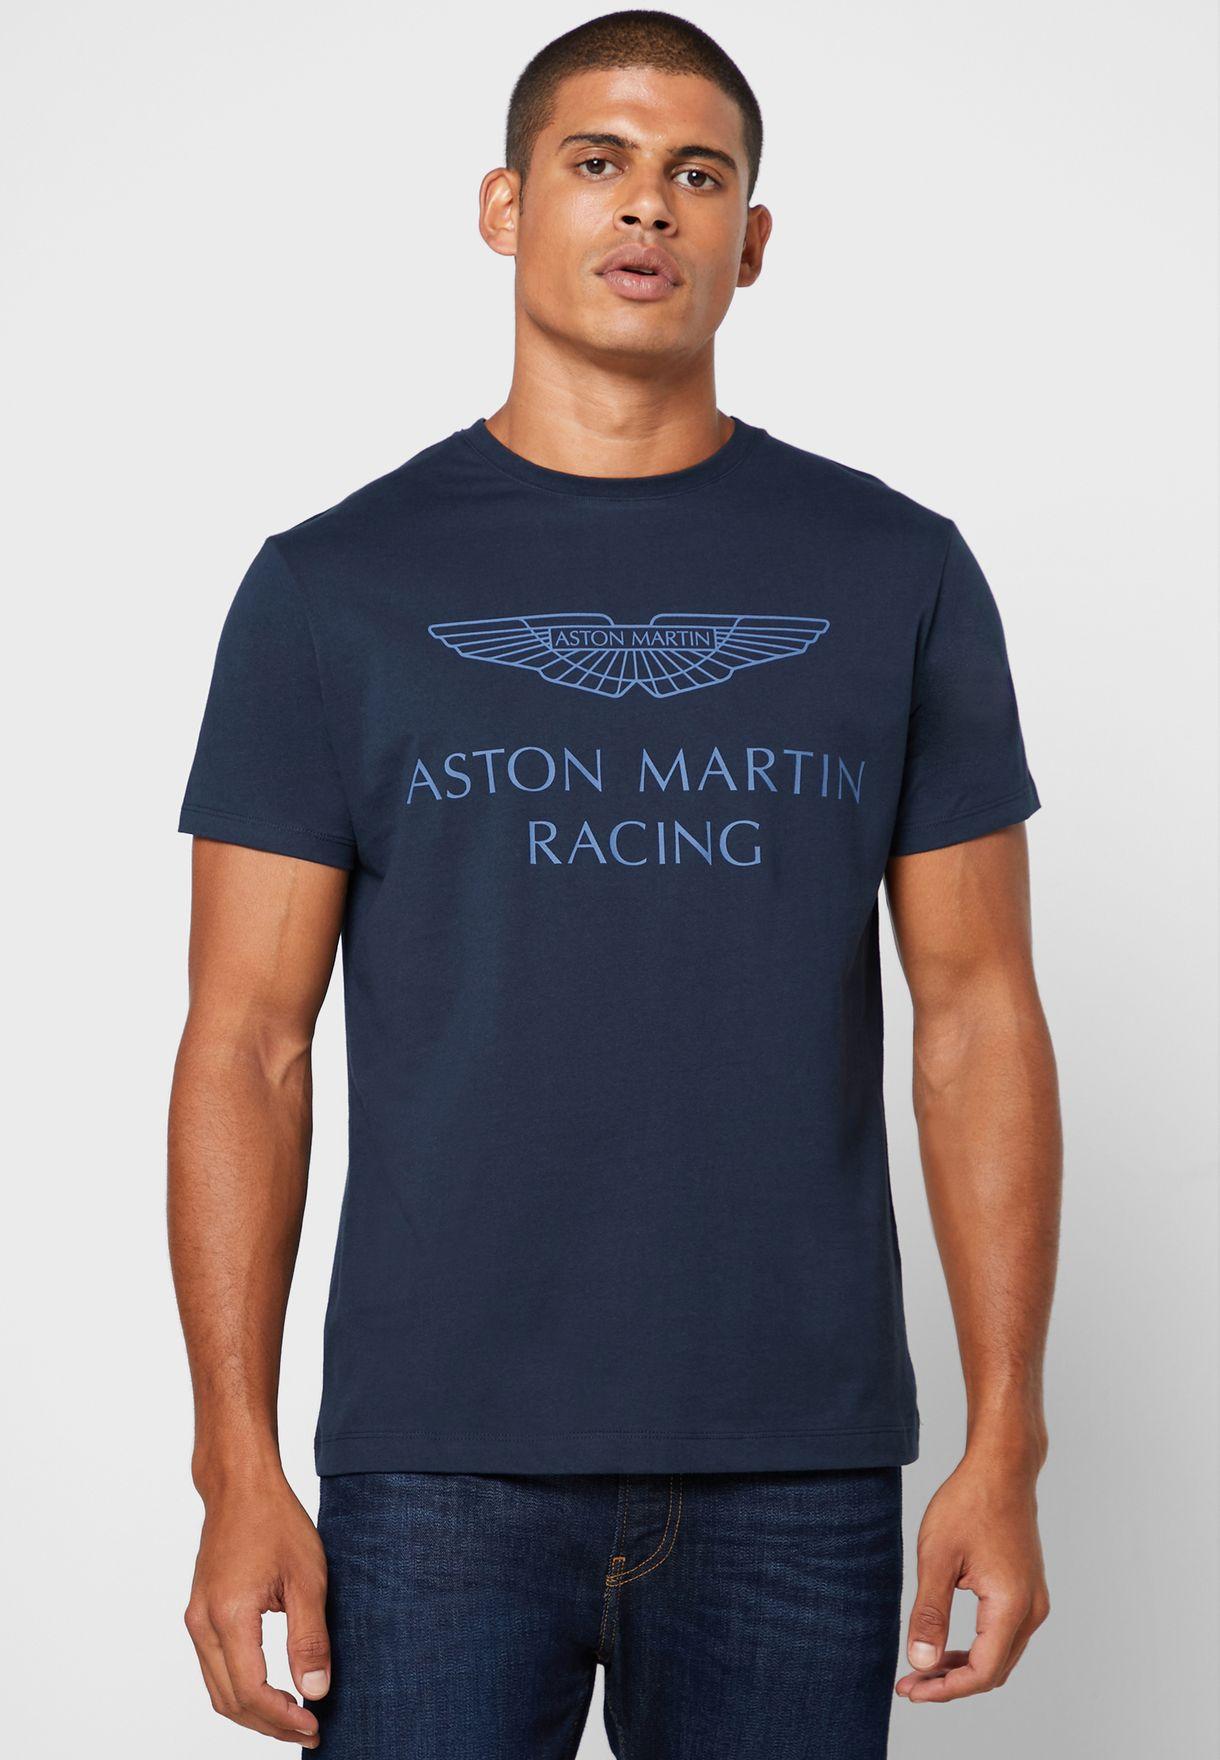 Buy Hackett Navy Aston Martin Racing Crew Neck T Shirt For Men In Mena Worldwide Hm500363